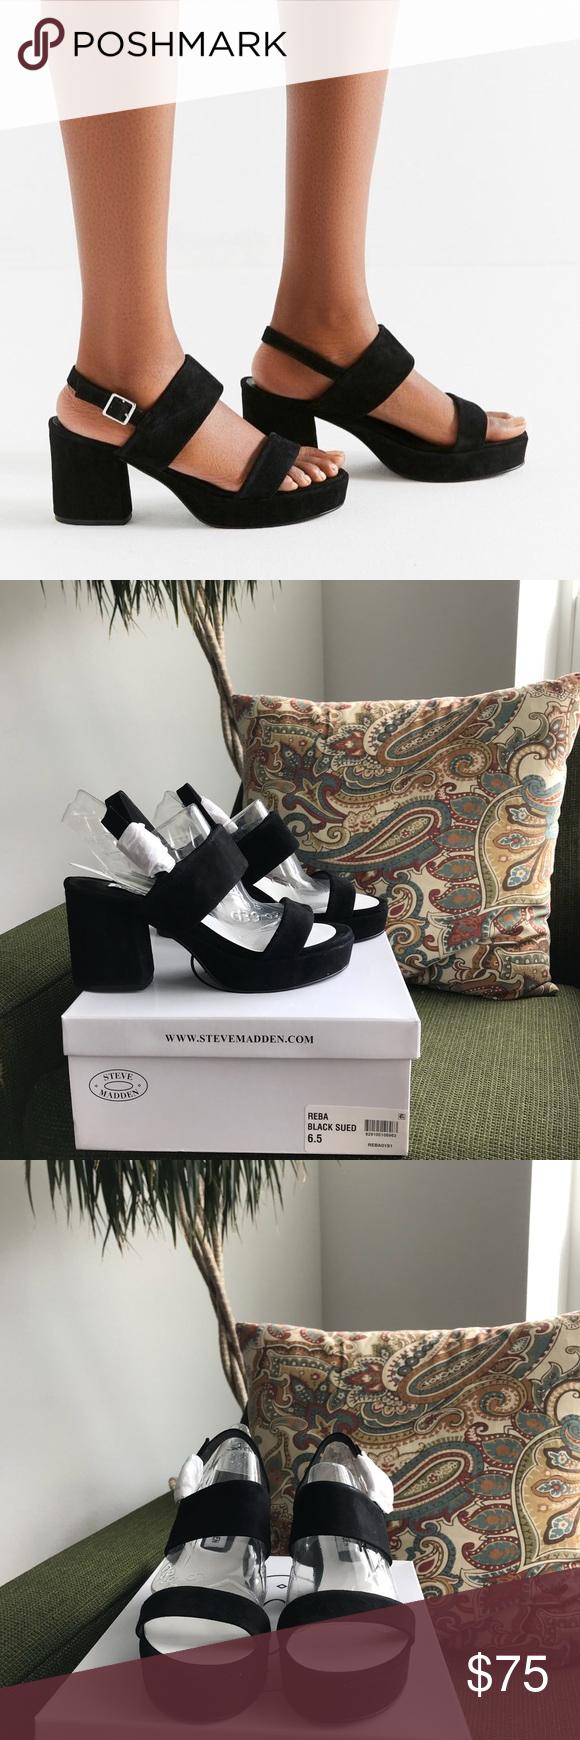 39c1e8108bed BRAND NEW Black Steve Madden Reba heeled Sandals The most amazing ...